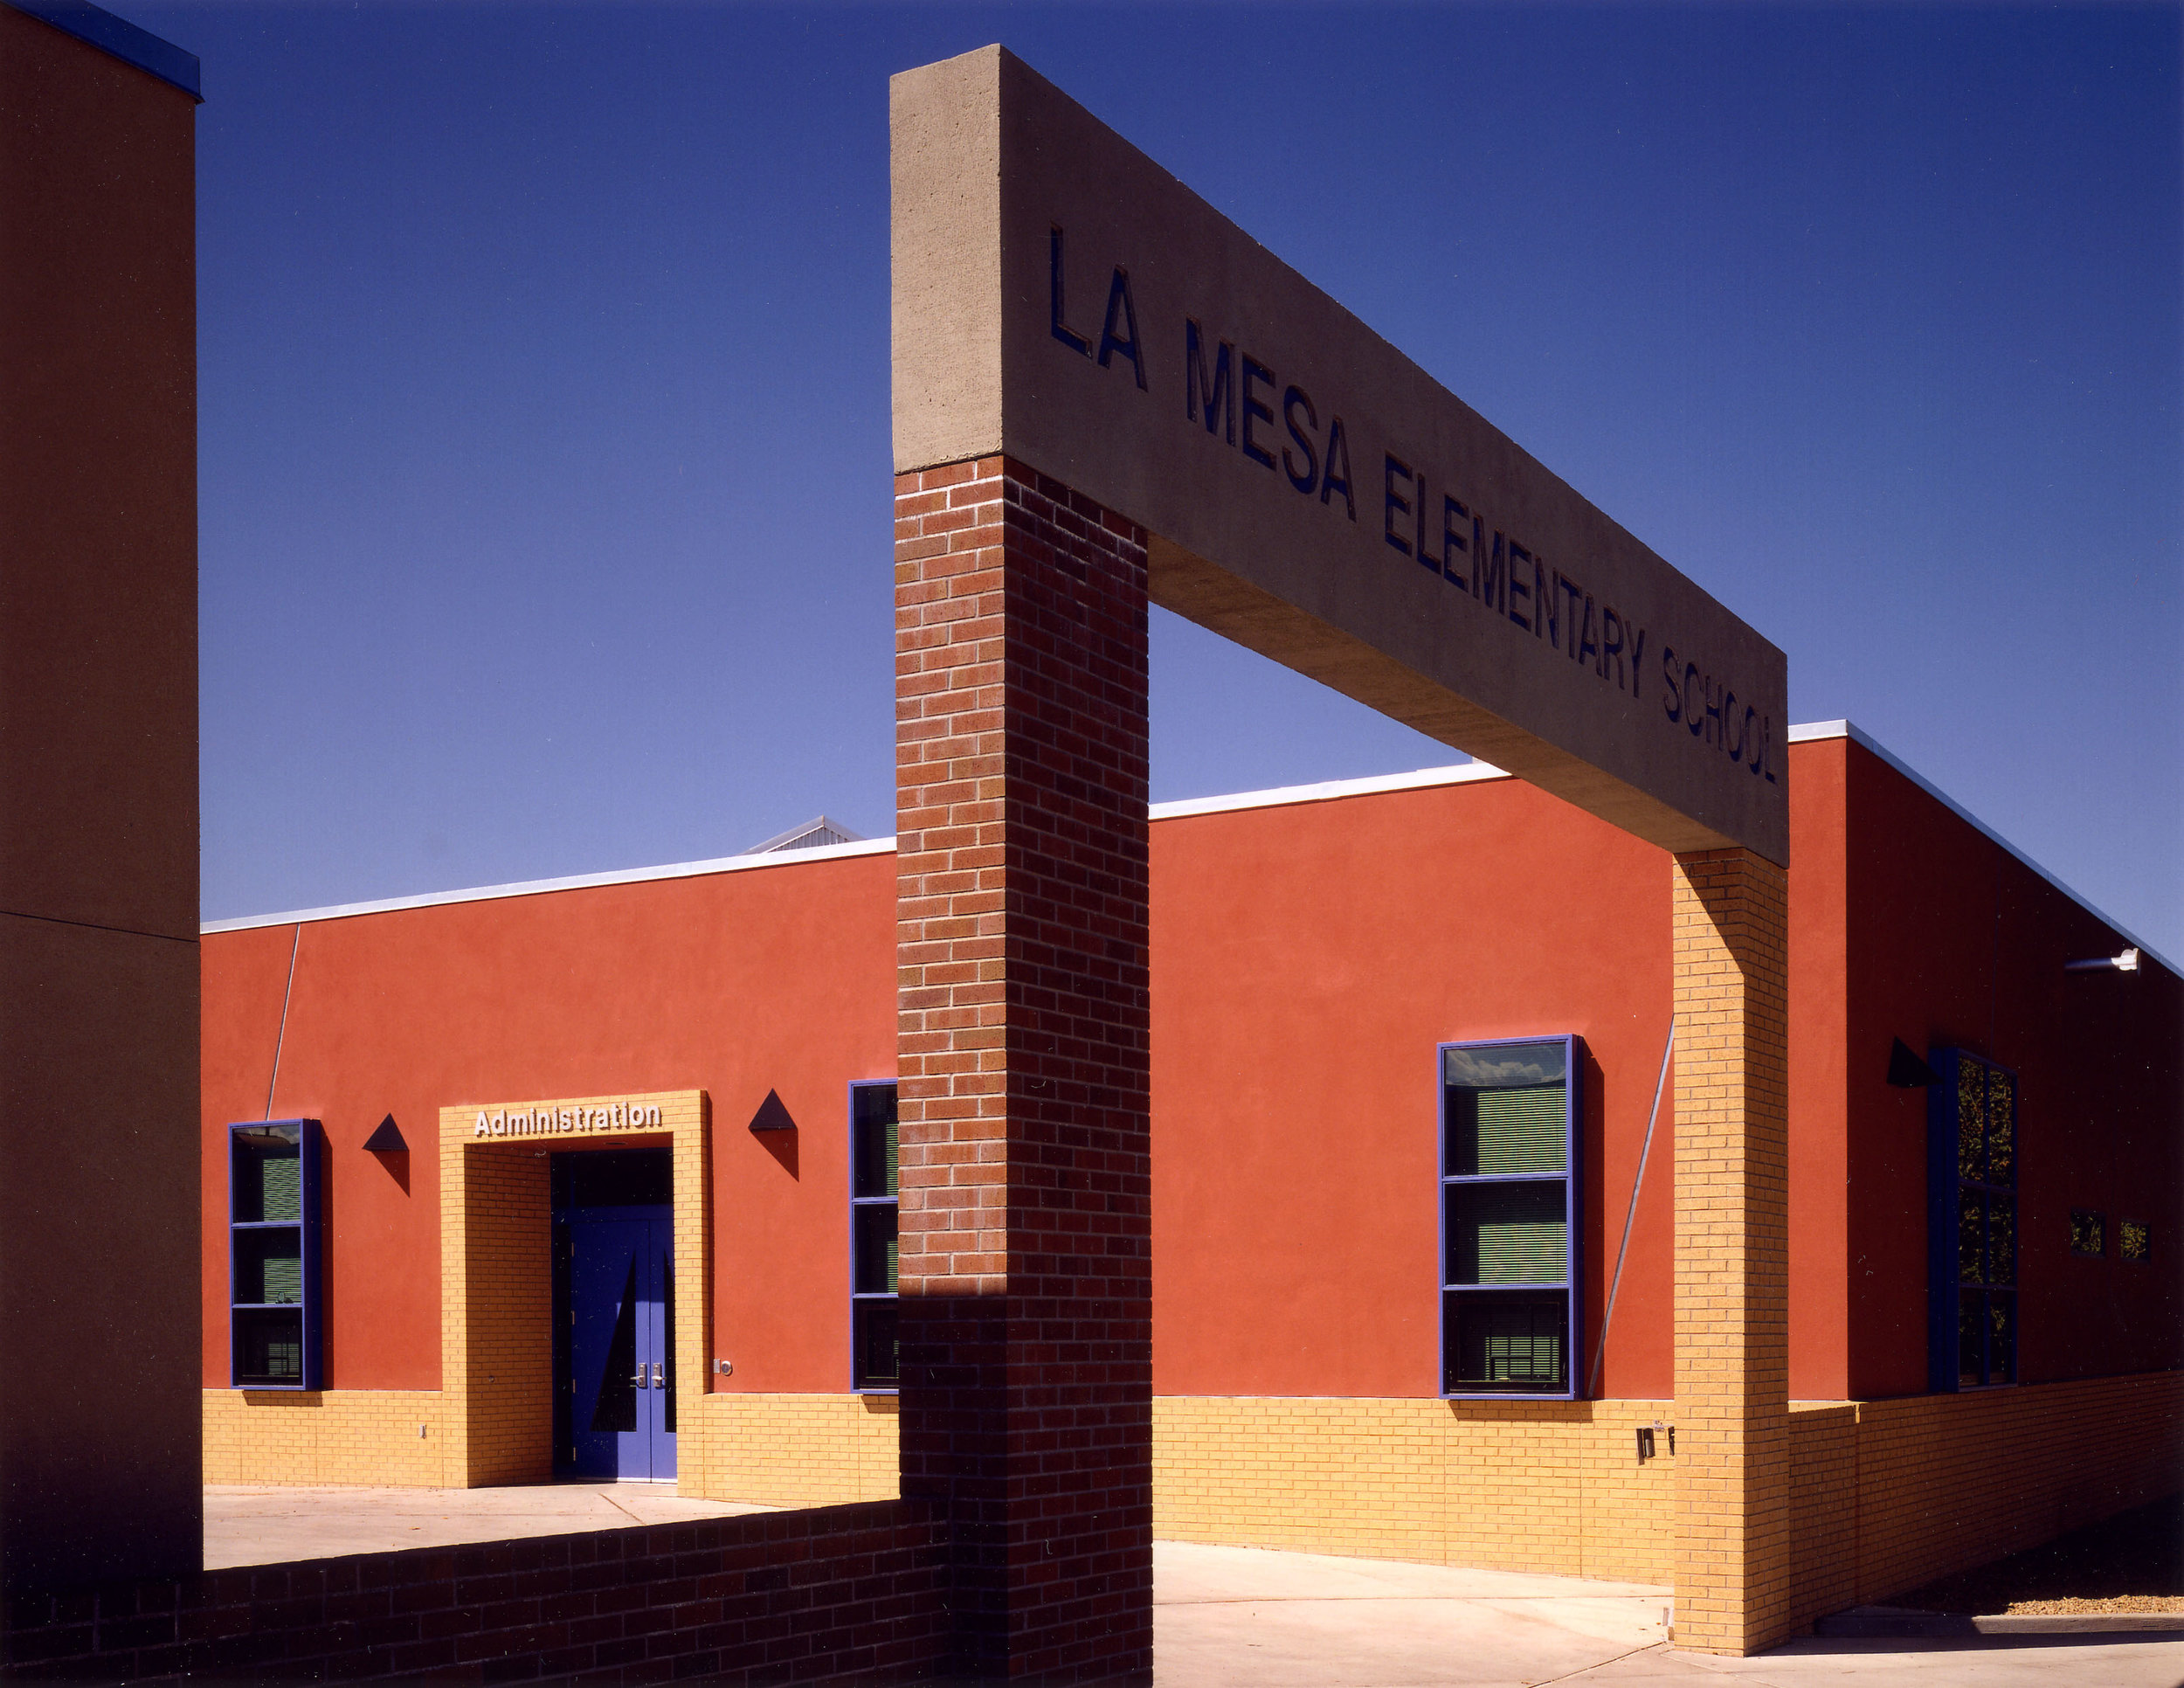 La_Mesa_Elementary_School_01.jpg